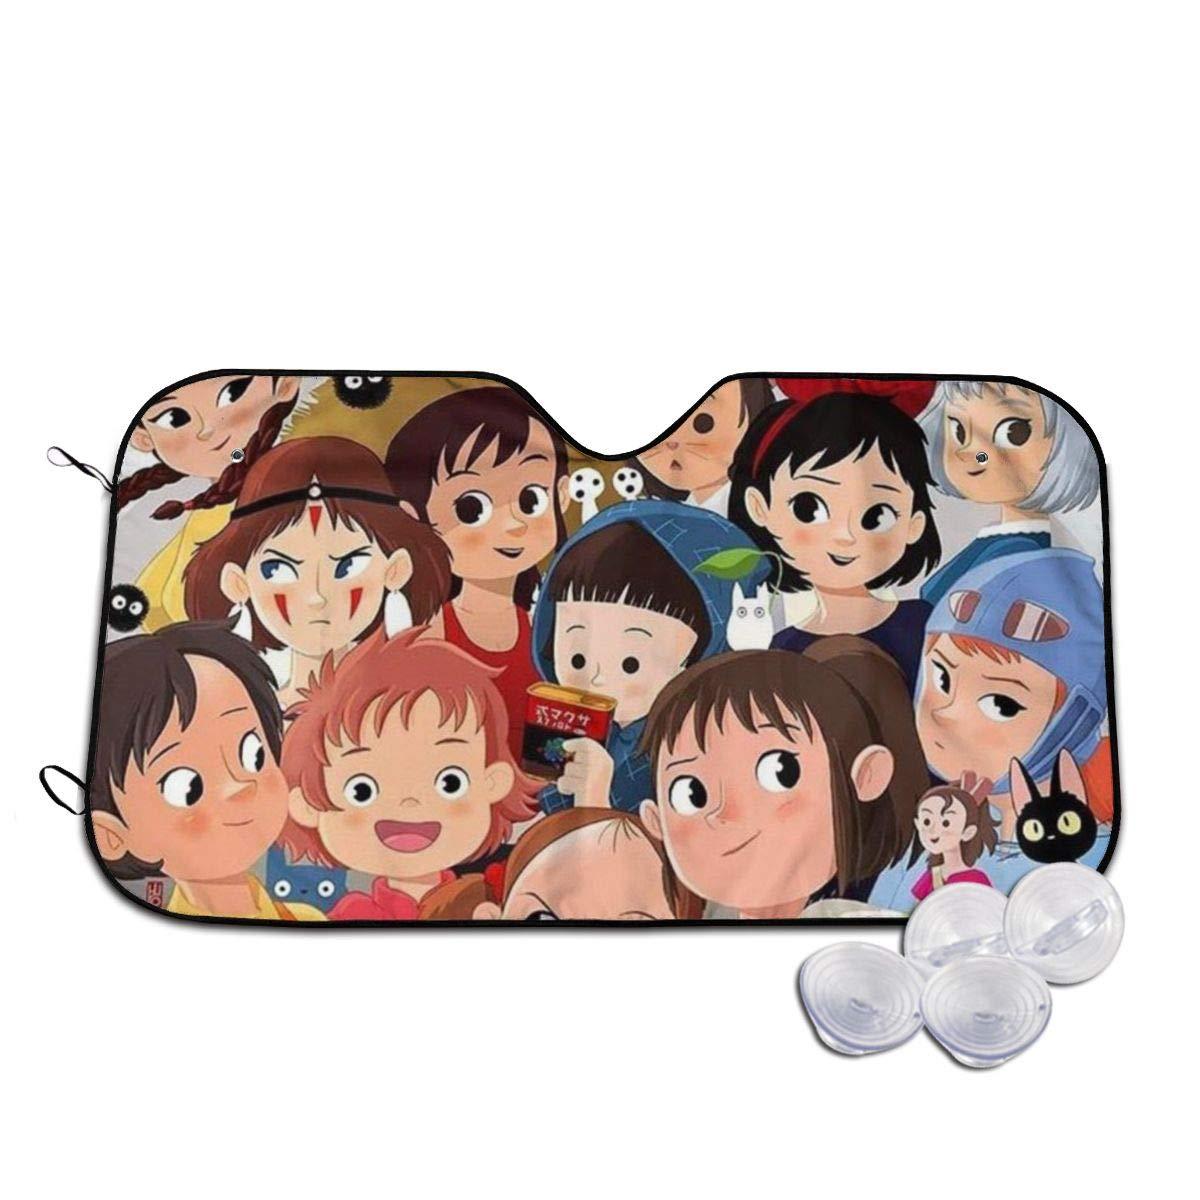 Studio Ghibli,Hayao Miyazaki Anime Front Windshield Sun Shade Blocks Uv Rays Sun Visor Accordion Folding Auto Sunshade for Car Truck SUV Small